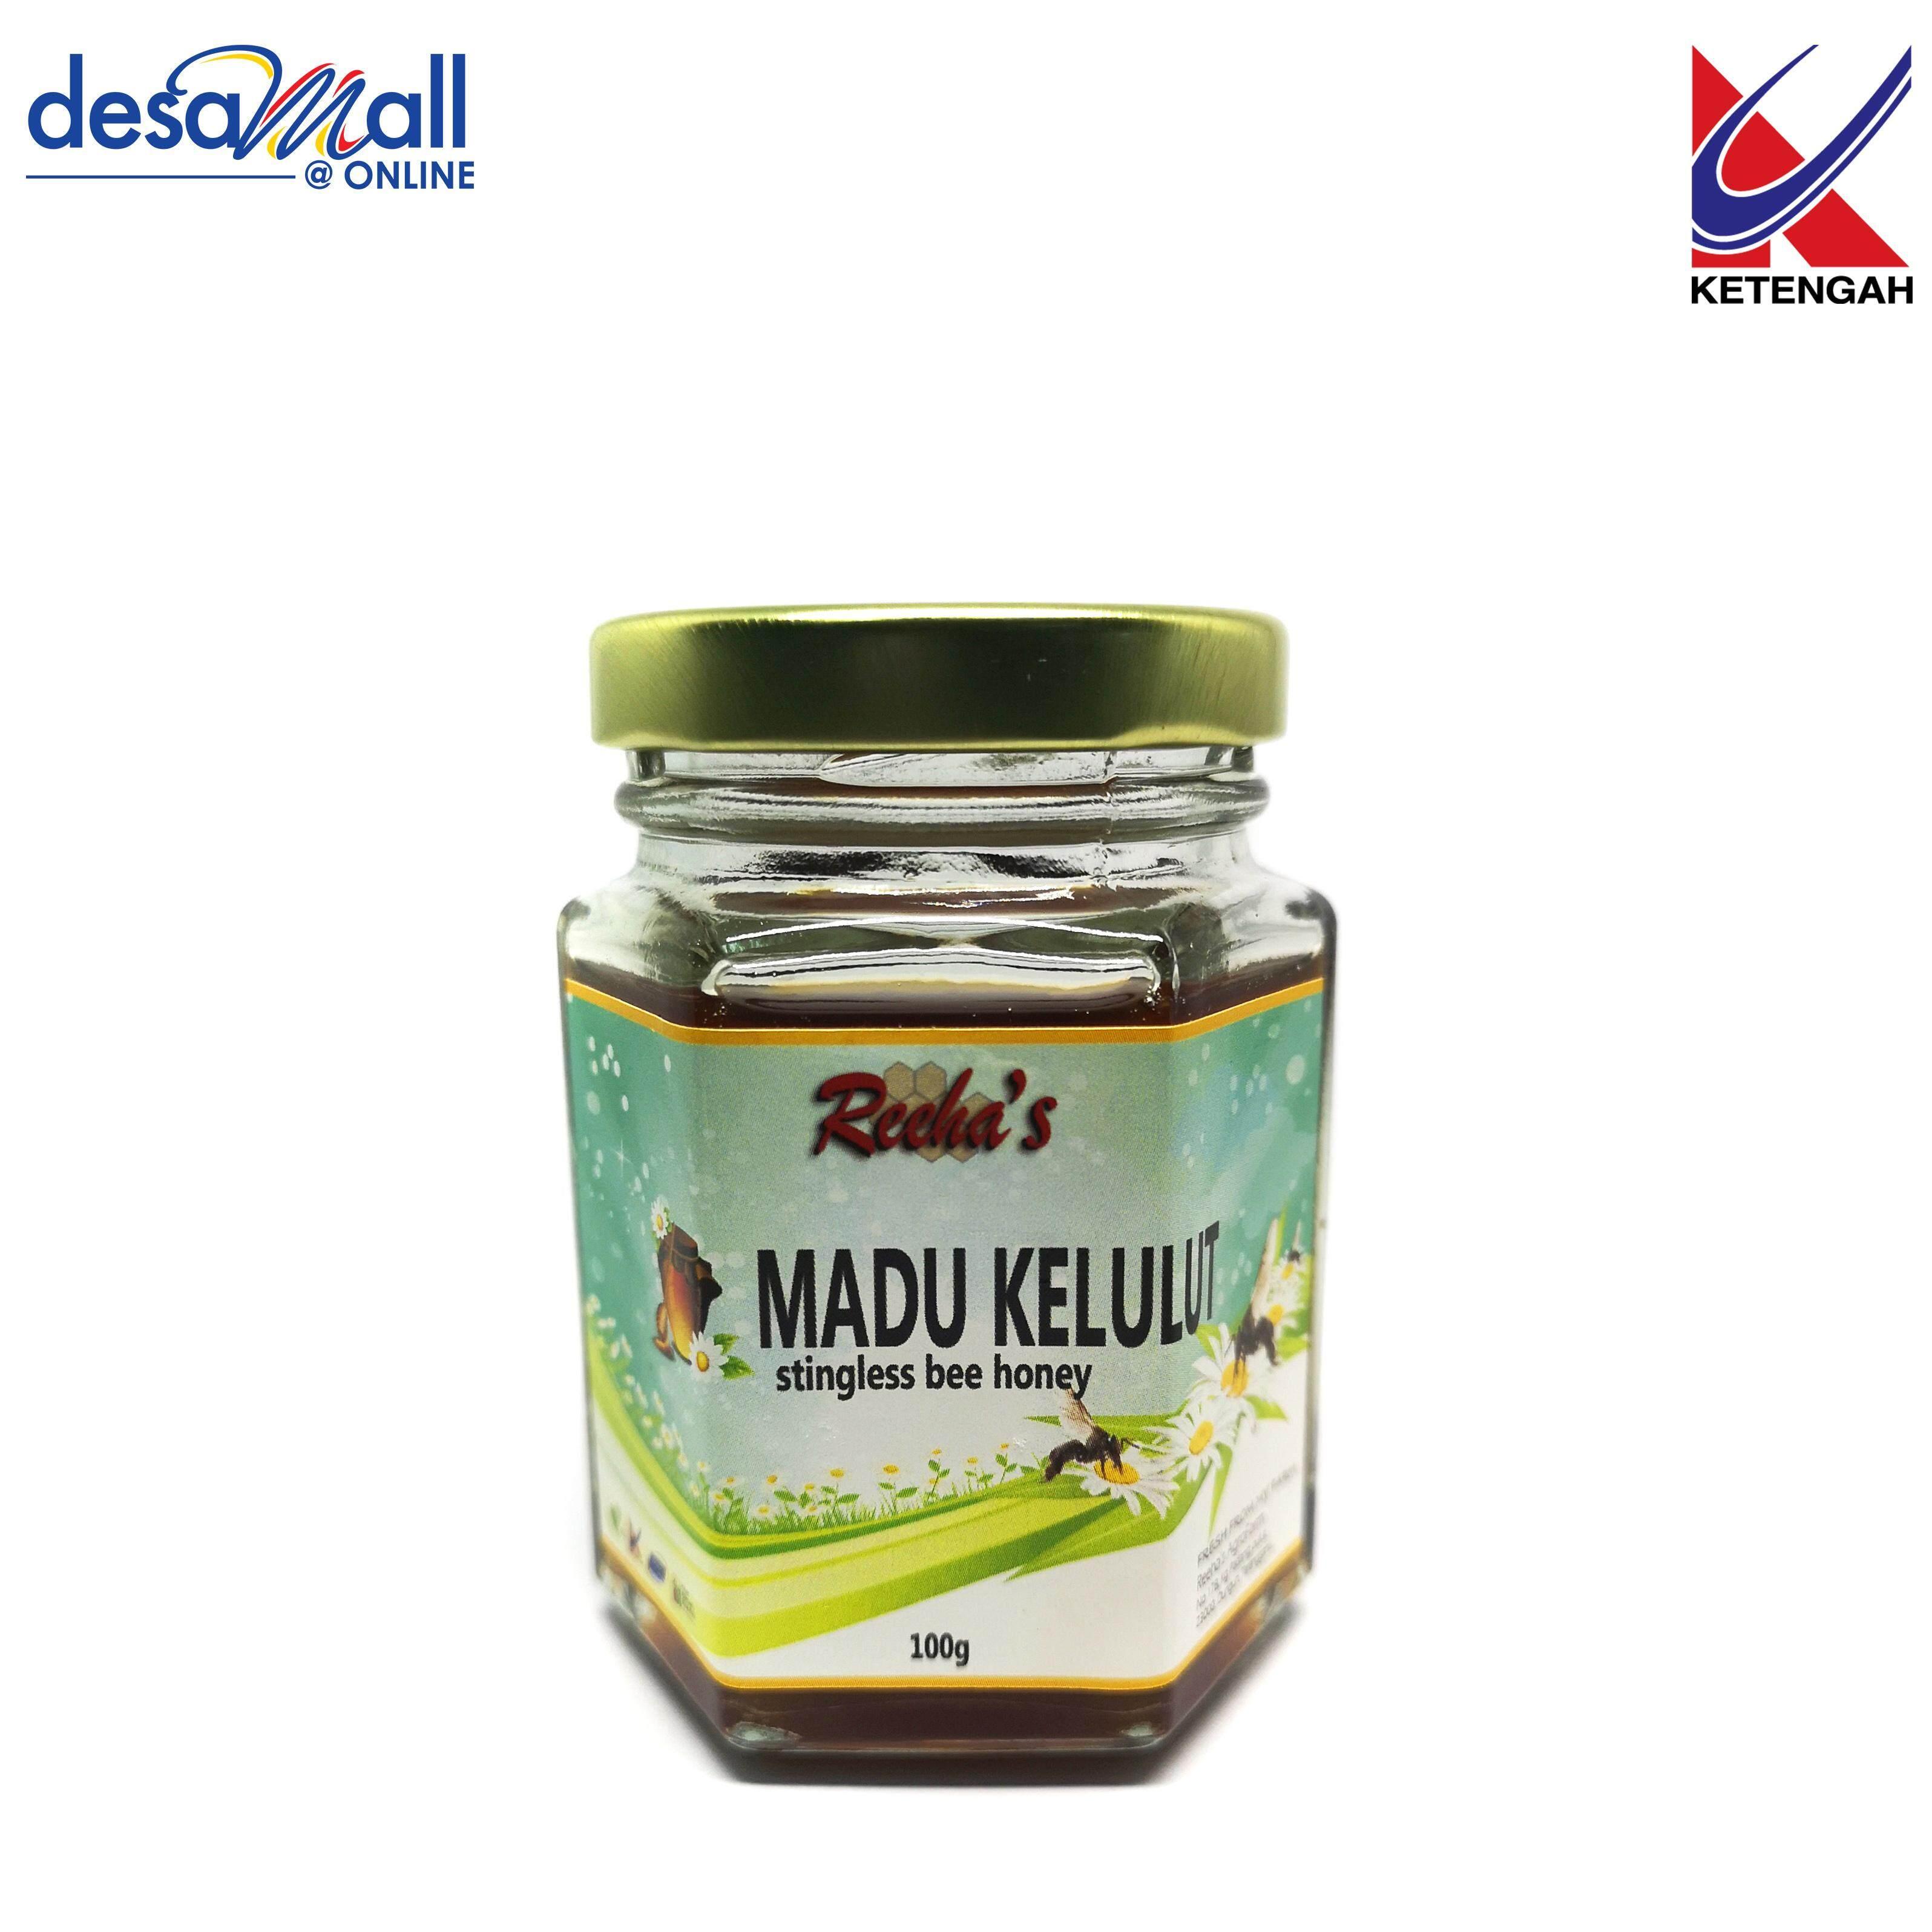 Combo Reeha's Madu Kelulut Stingless Bee Honey RTD Kualiti Premium (100g,200g, 500g)